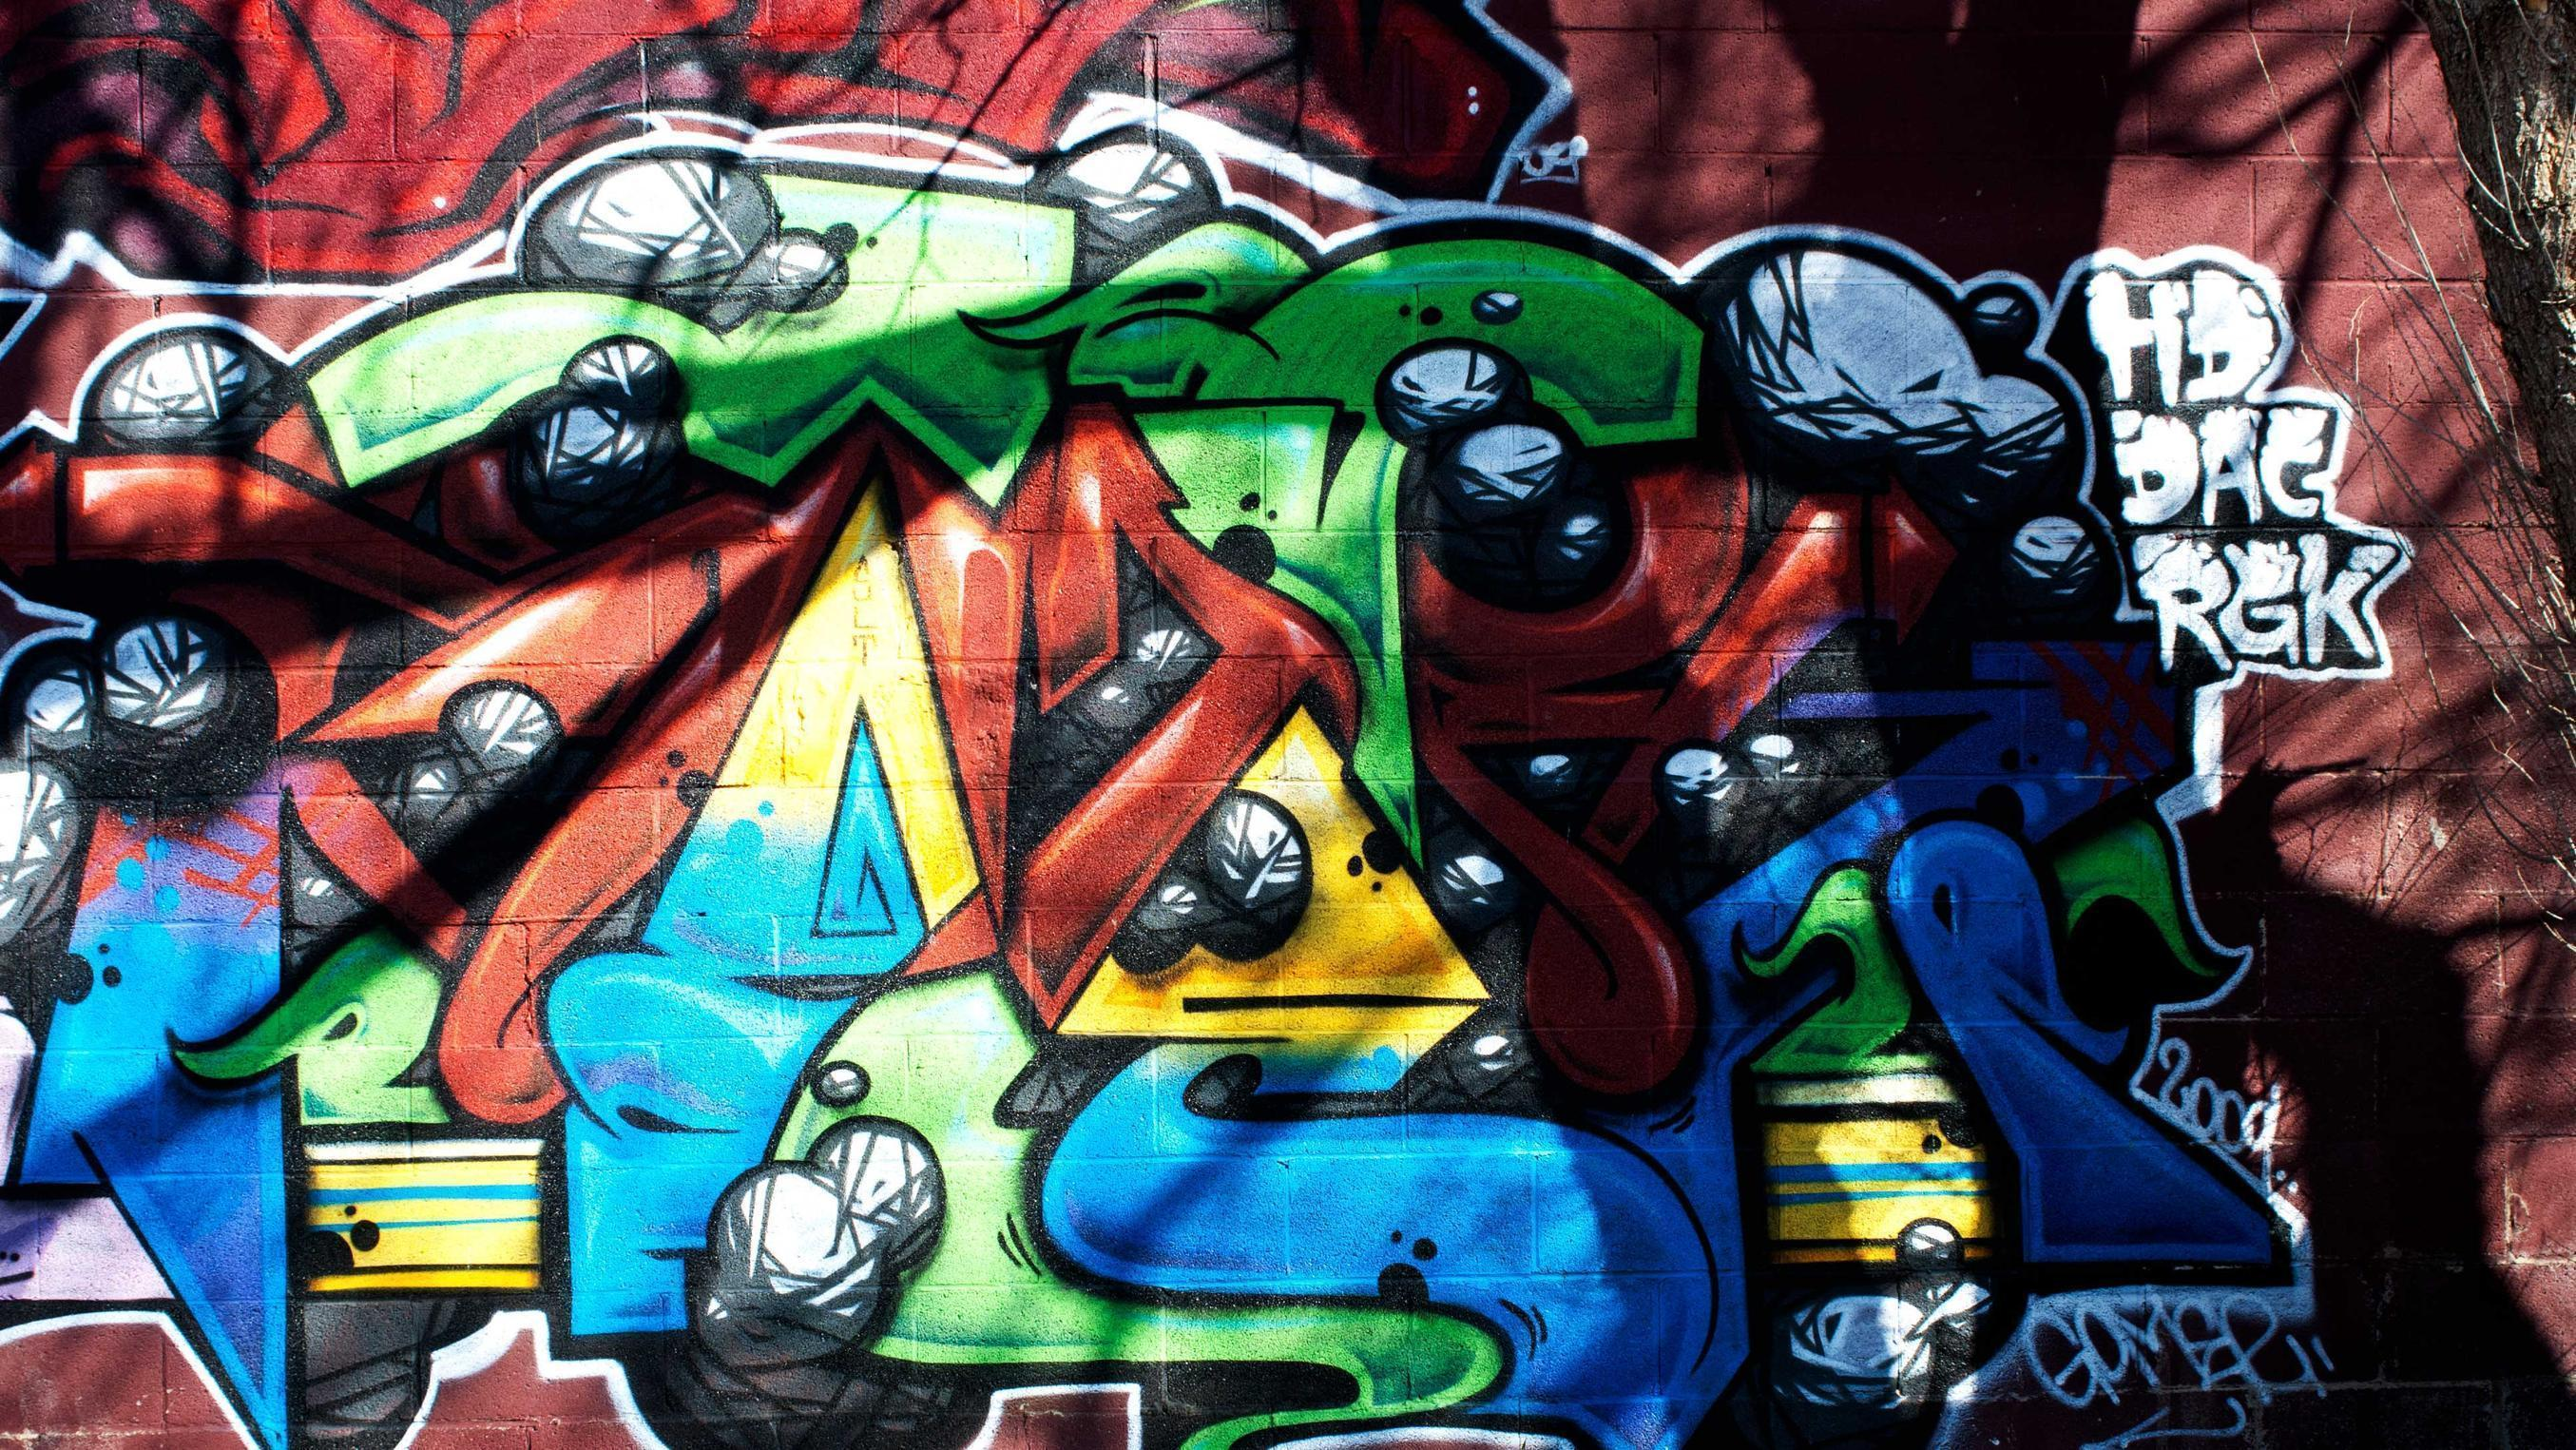 Wallpaper Graffiti Keren 3d Hd Graffiti Wallpapers Wallpaper Cave